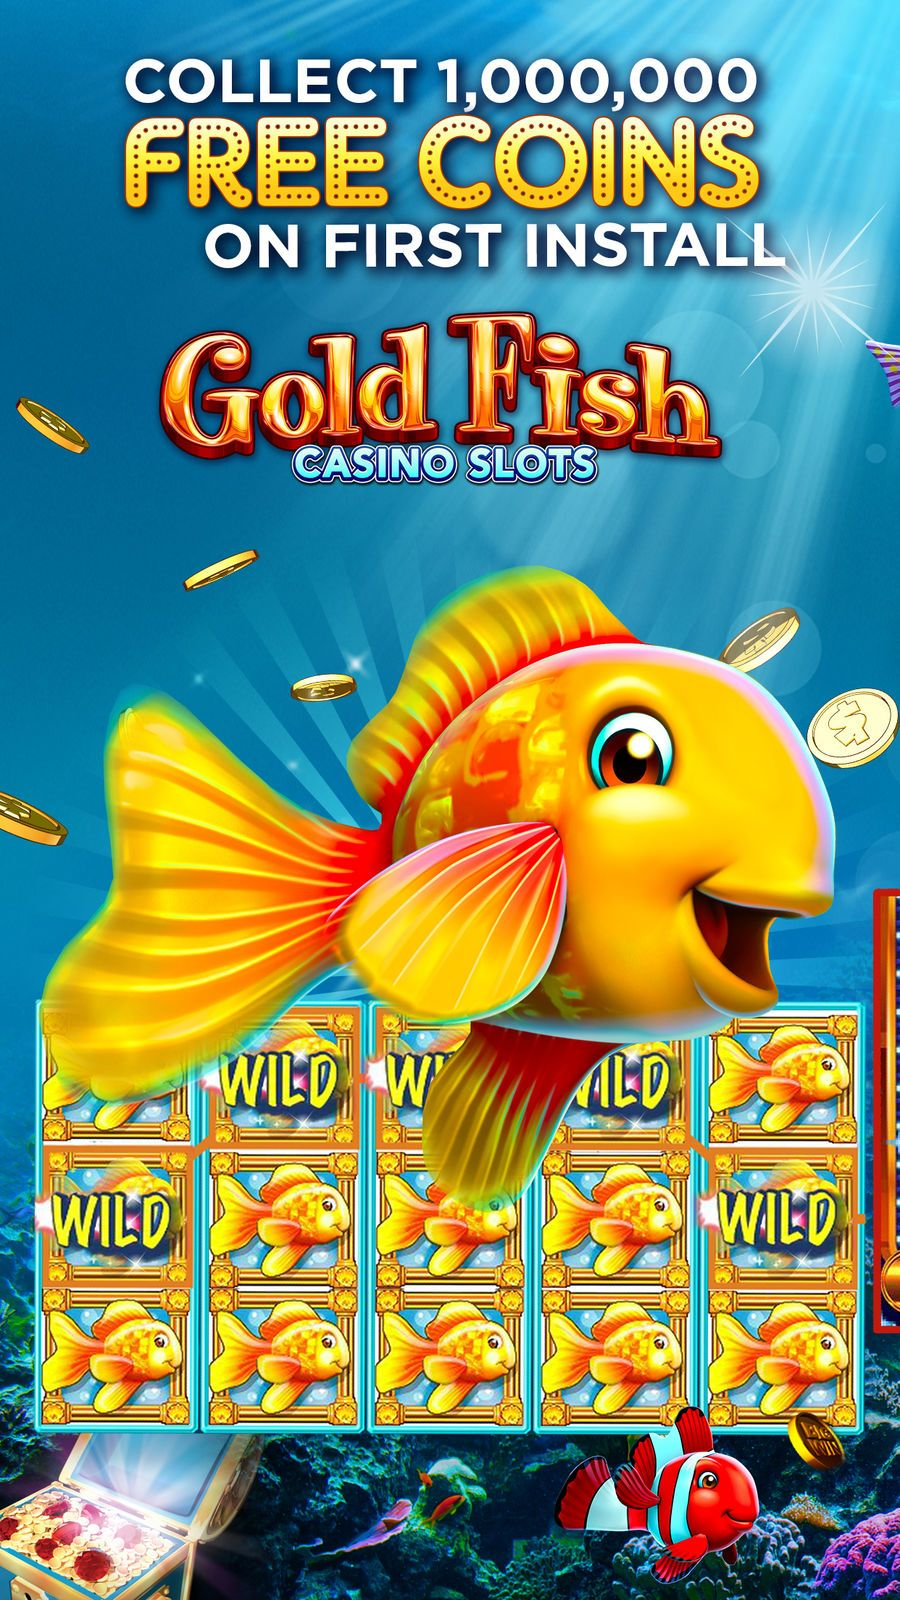 Gold fish casino slots games efxphantomcardios gold